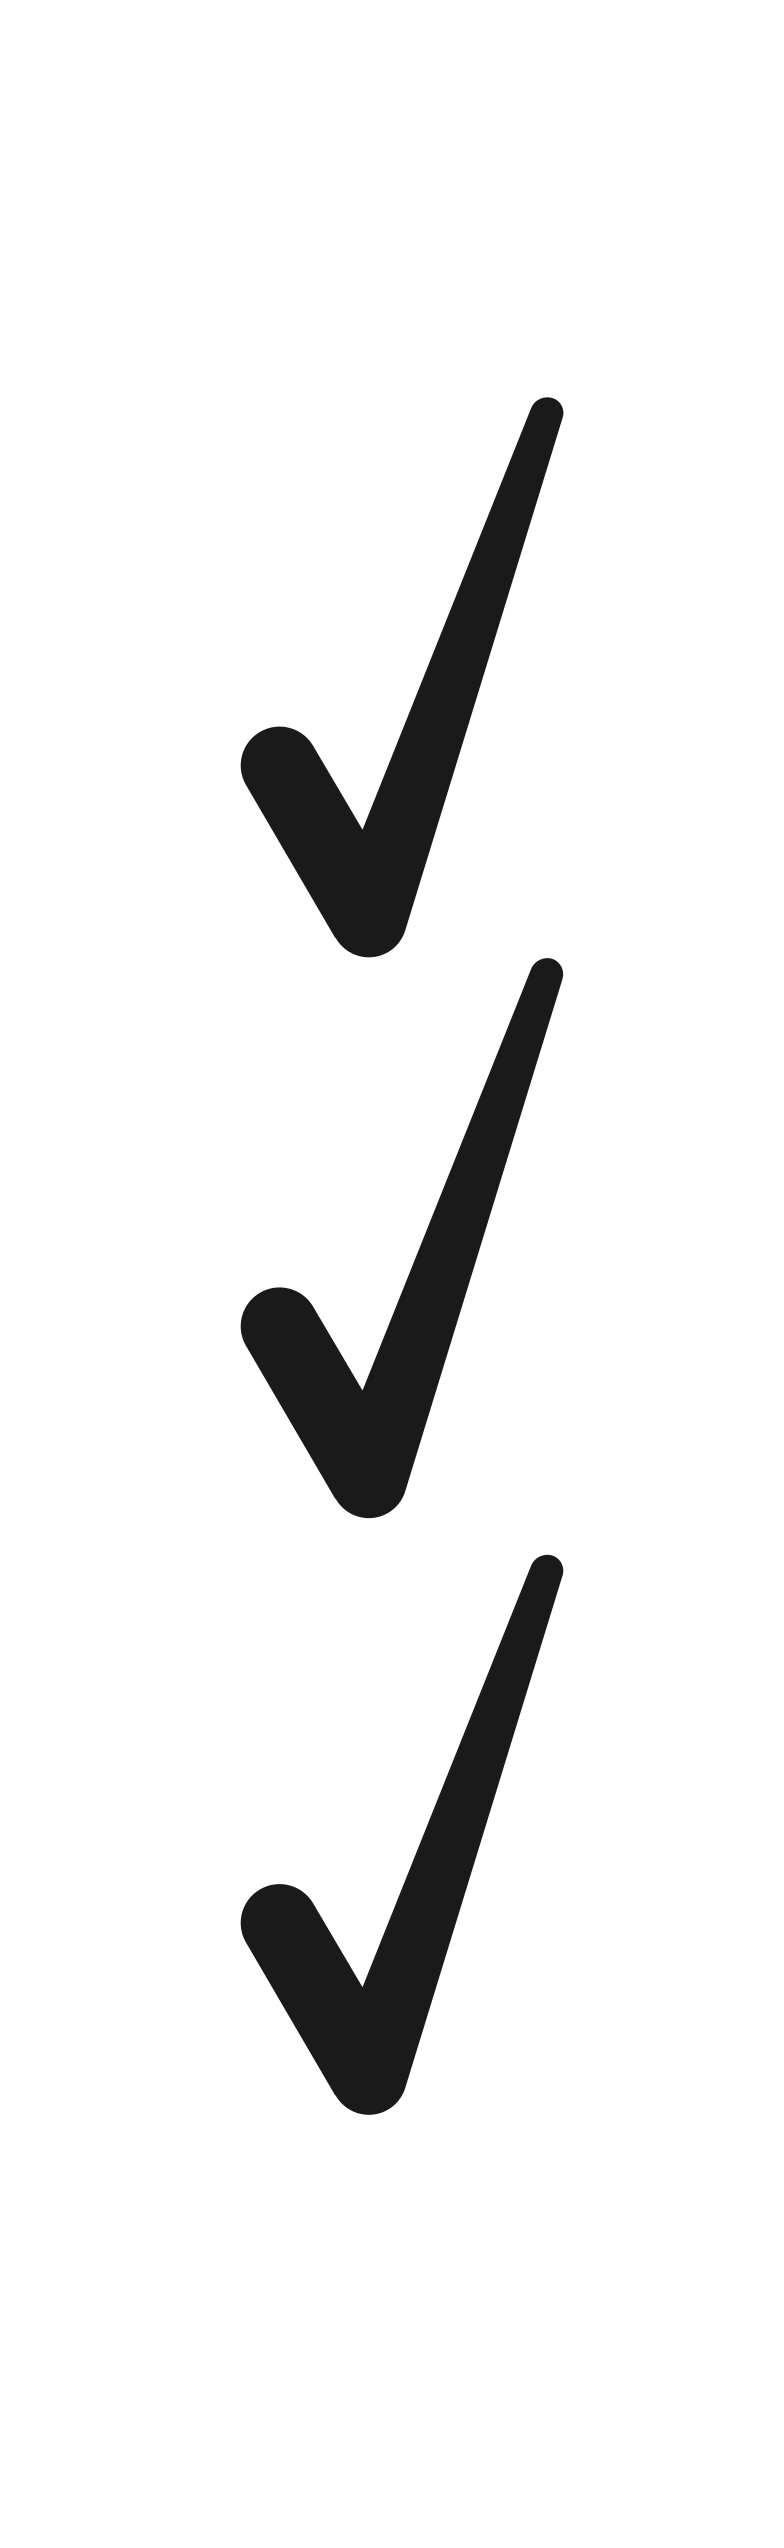 checklist Clipart illustration in PNG, SVG